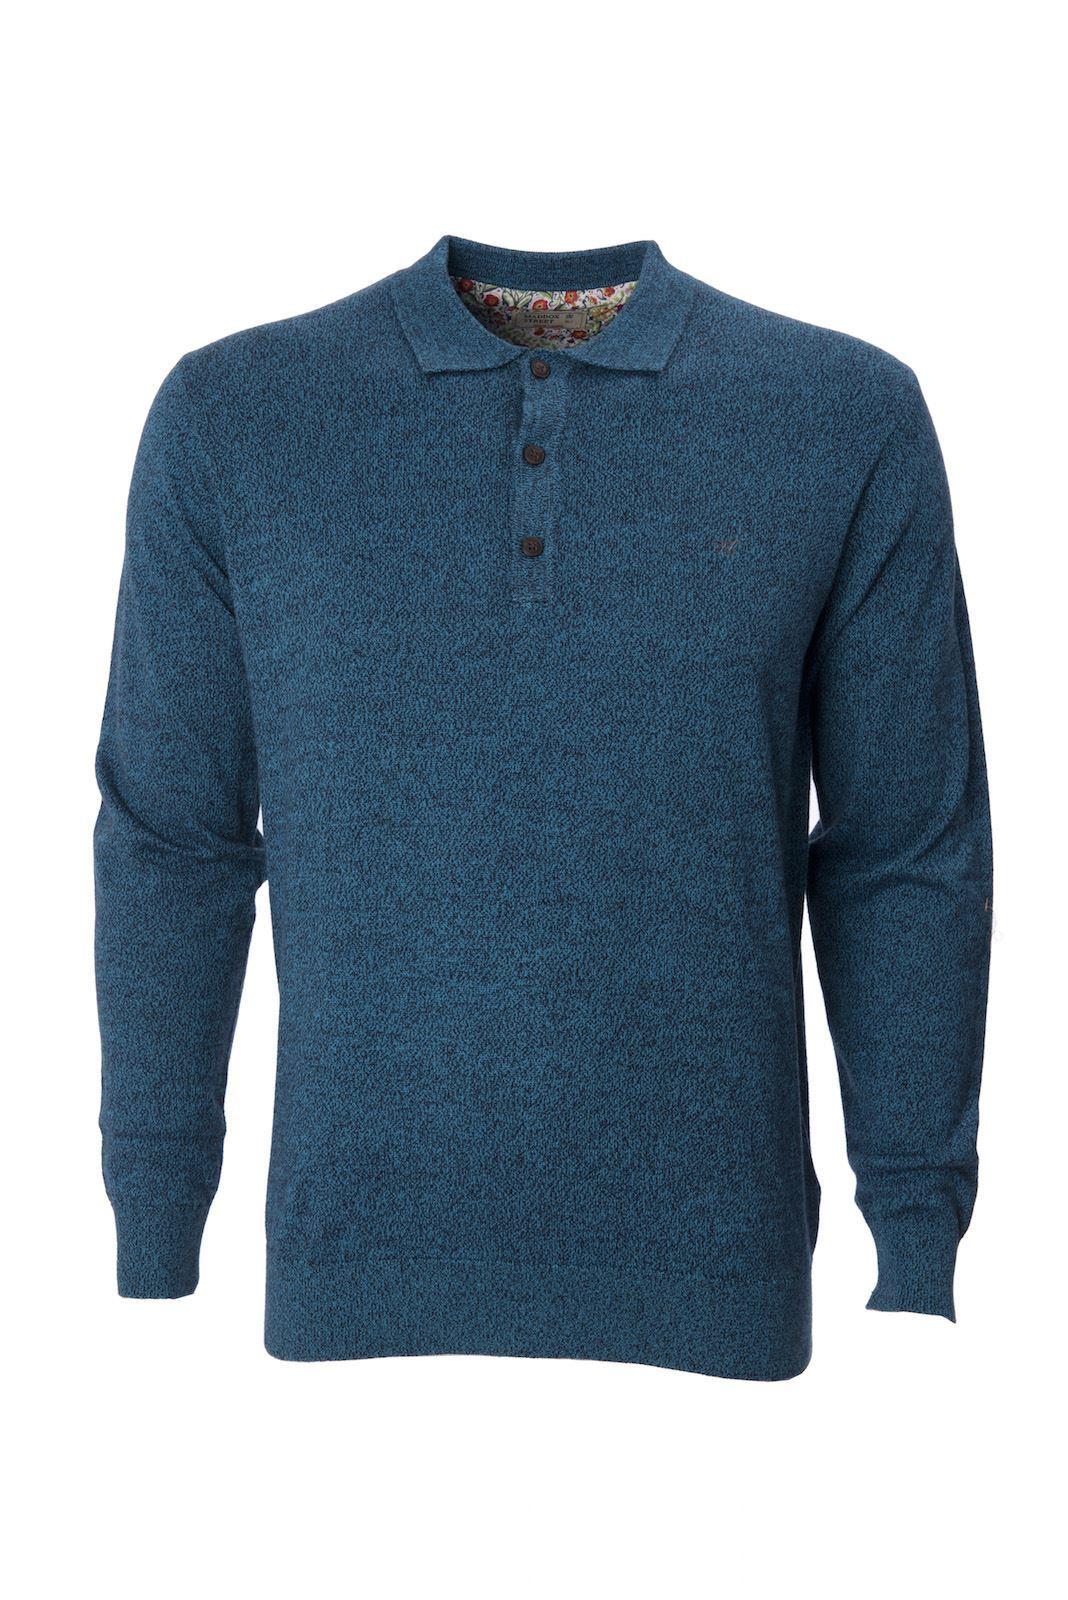 Maddox street mens knitted polo shirt collared long sleeve for Ribbed long sleeve shirt